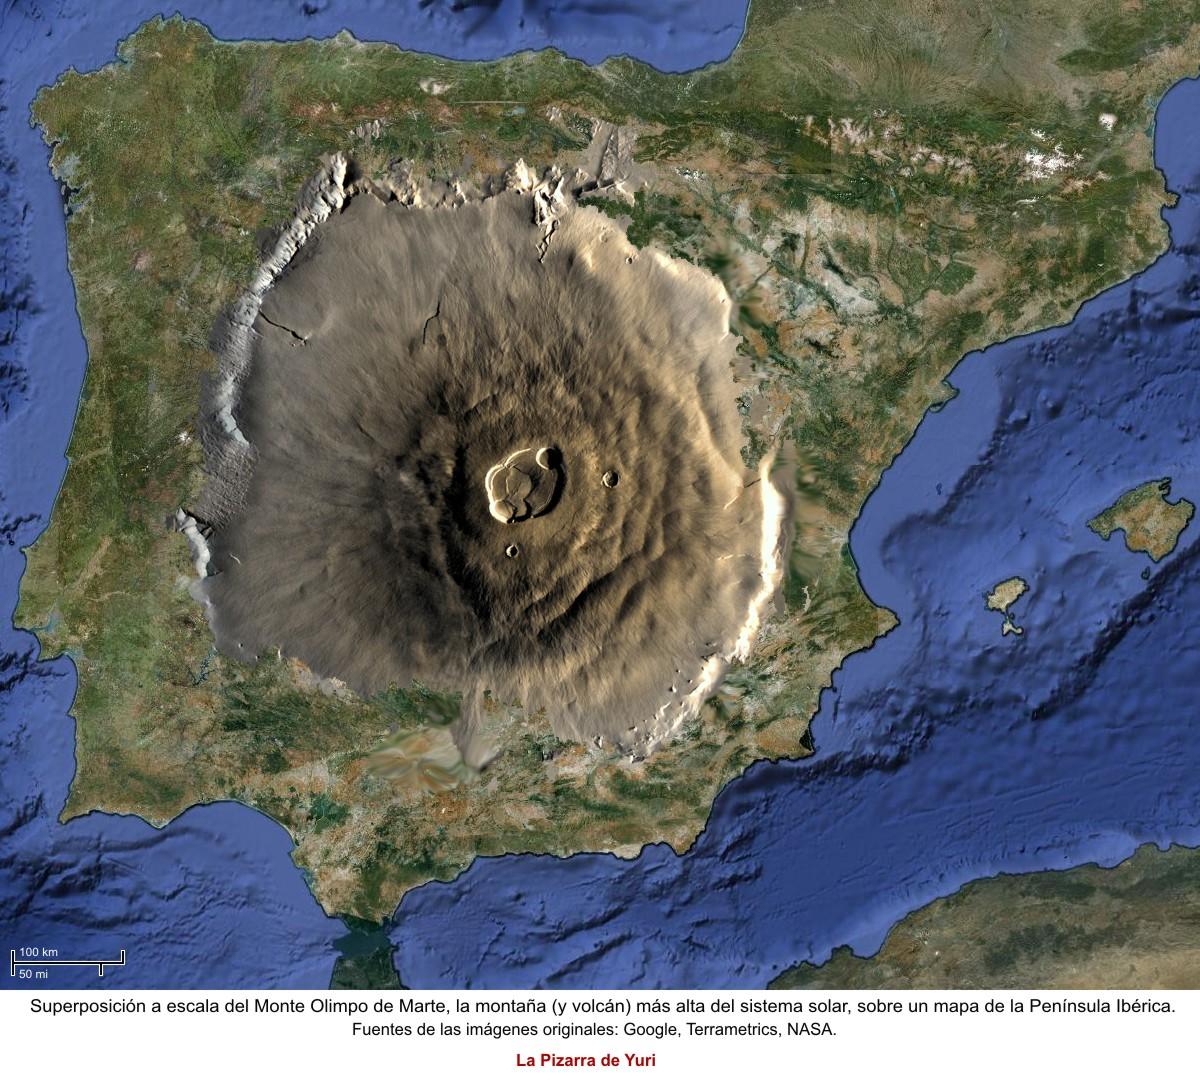 El Monte Olimpo de Marte Volcanes_olimpo_marte_peninsula_iberica